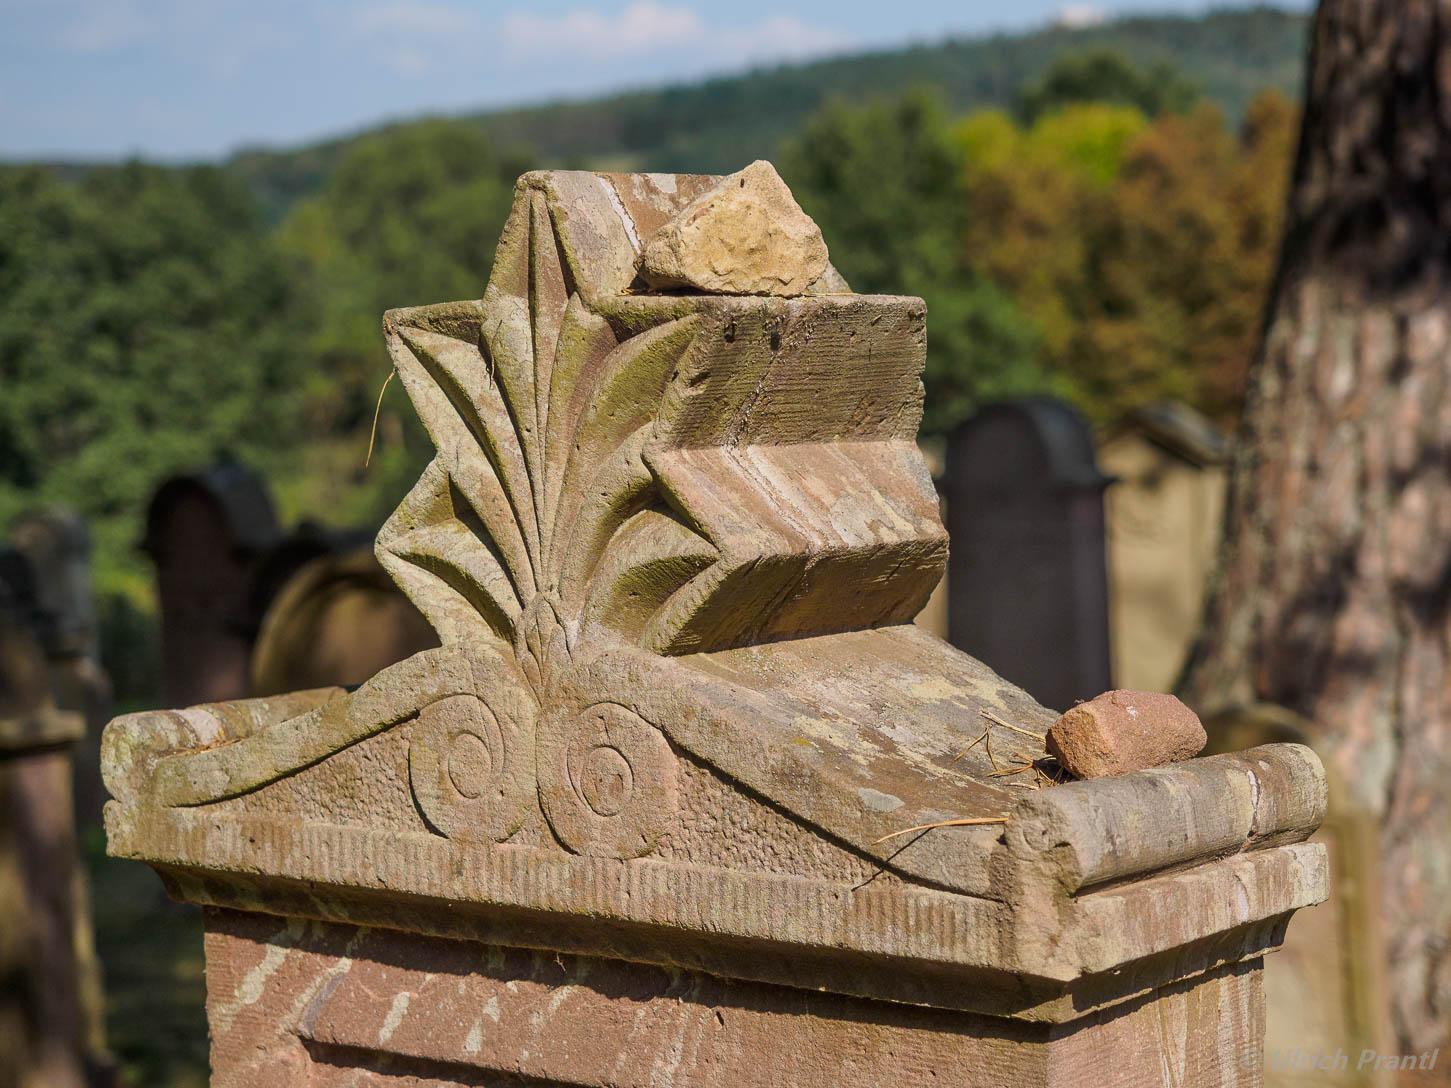 Grabmal, jpdischer Friedhof